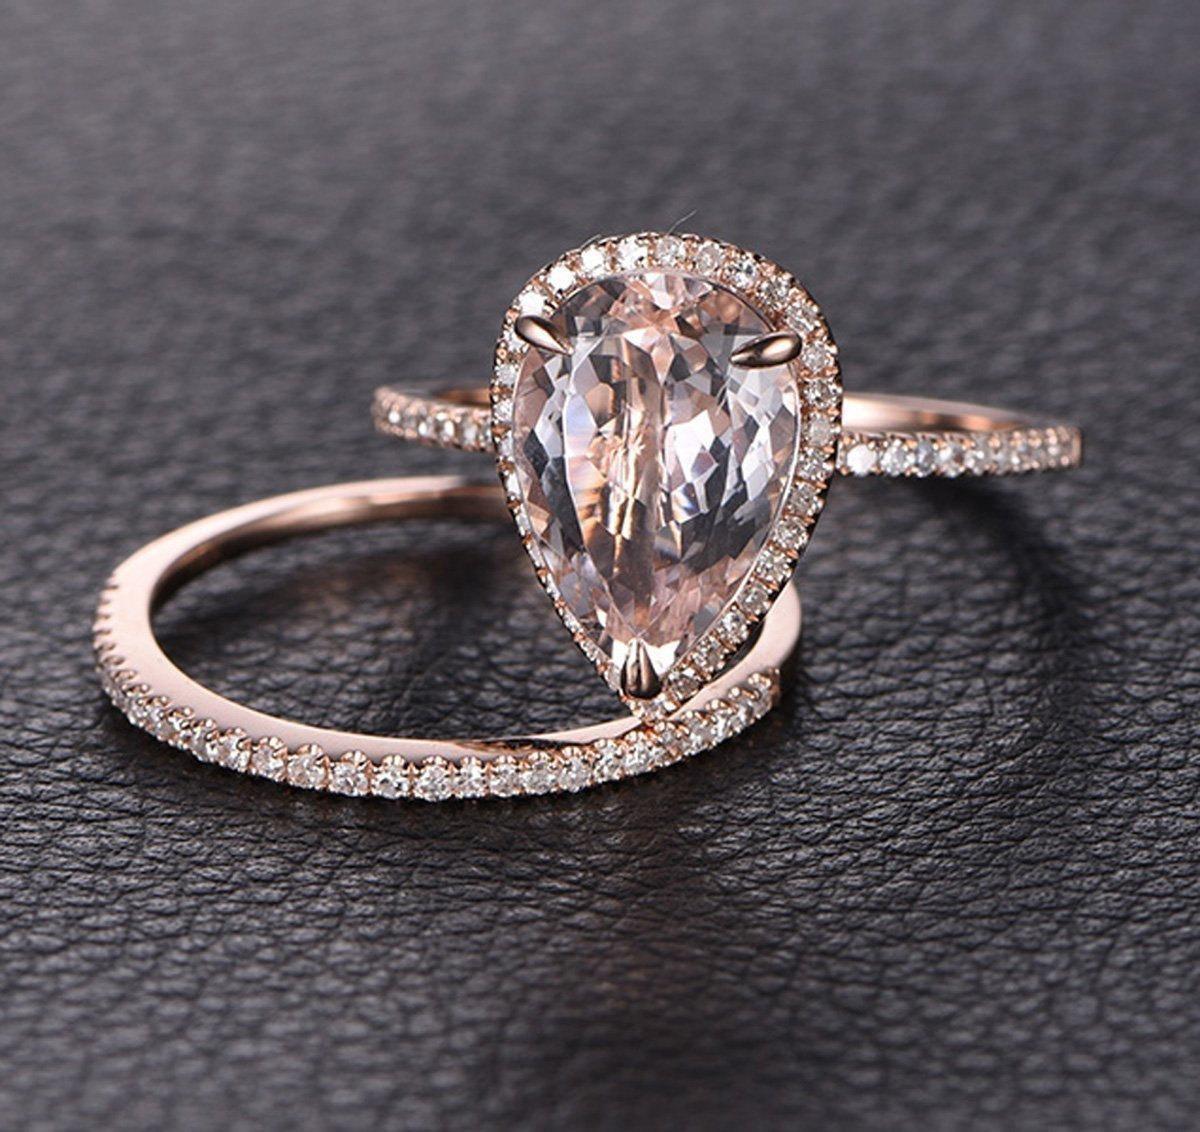 Perfect Bridal Set On Sale 1 50 Carat Pear Cut Morganite